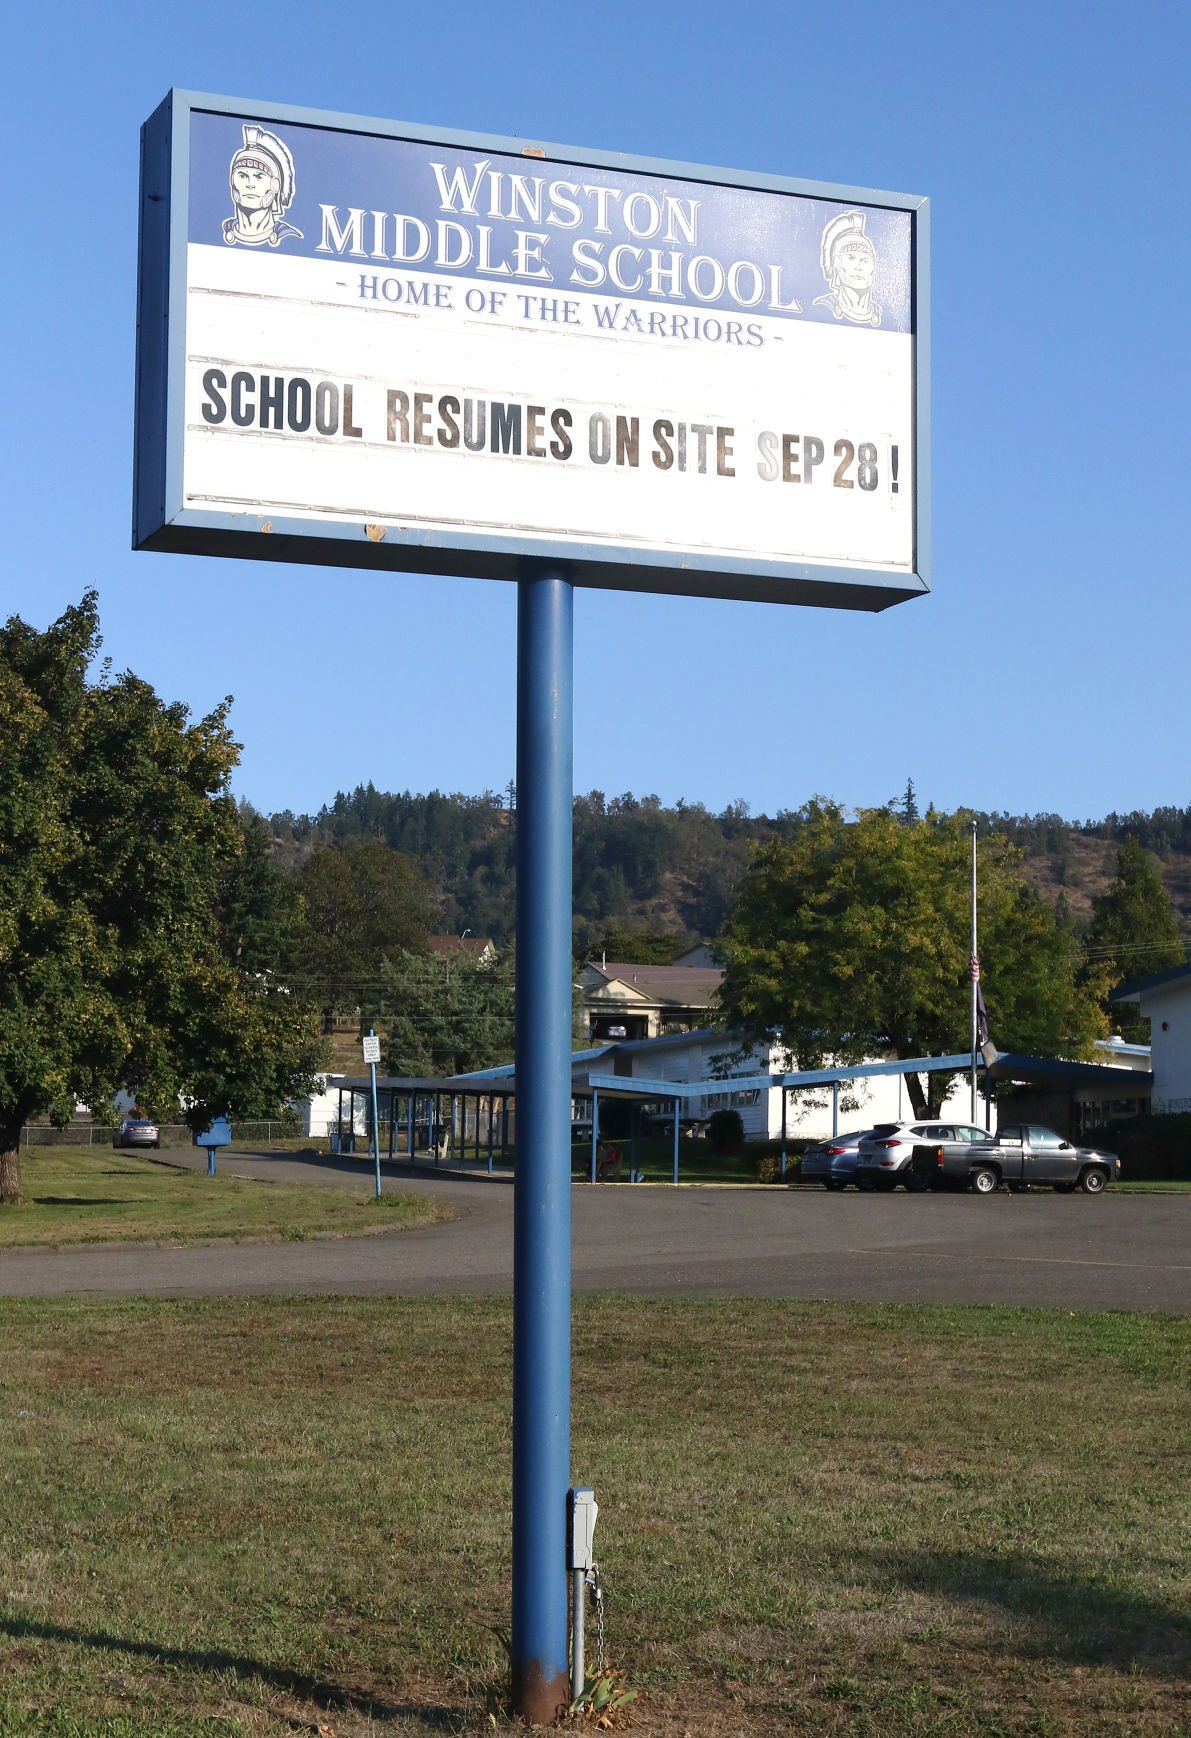 200930-nrr-schools-01